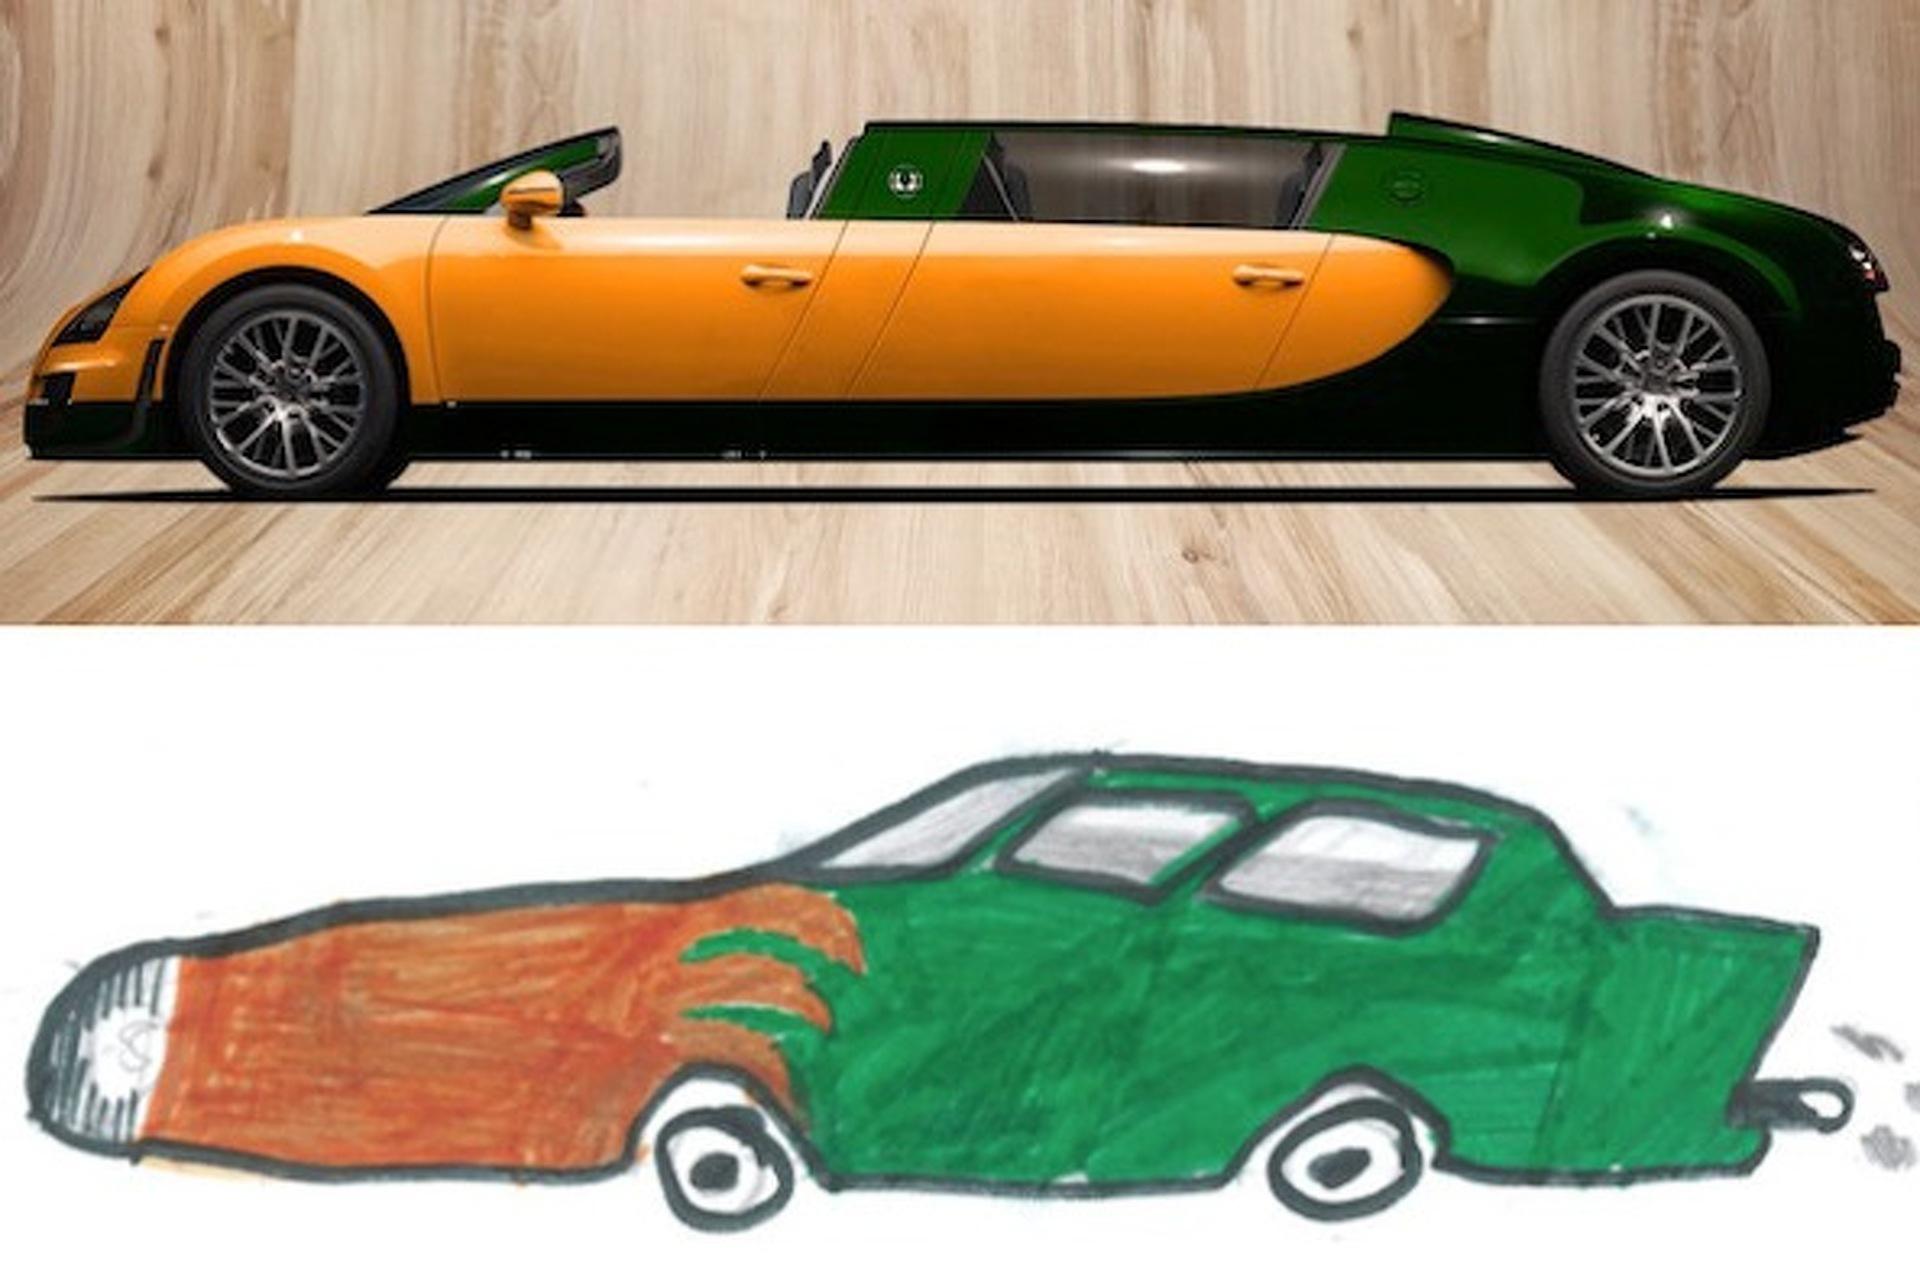 9-Year-Old Dreams Up a Bugatti Limo Concept